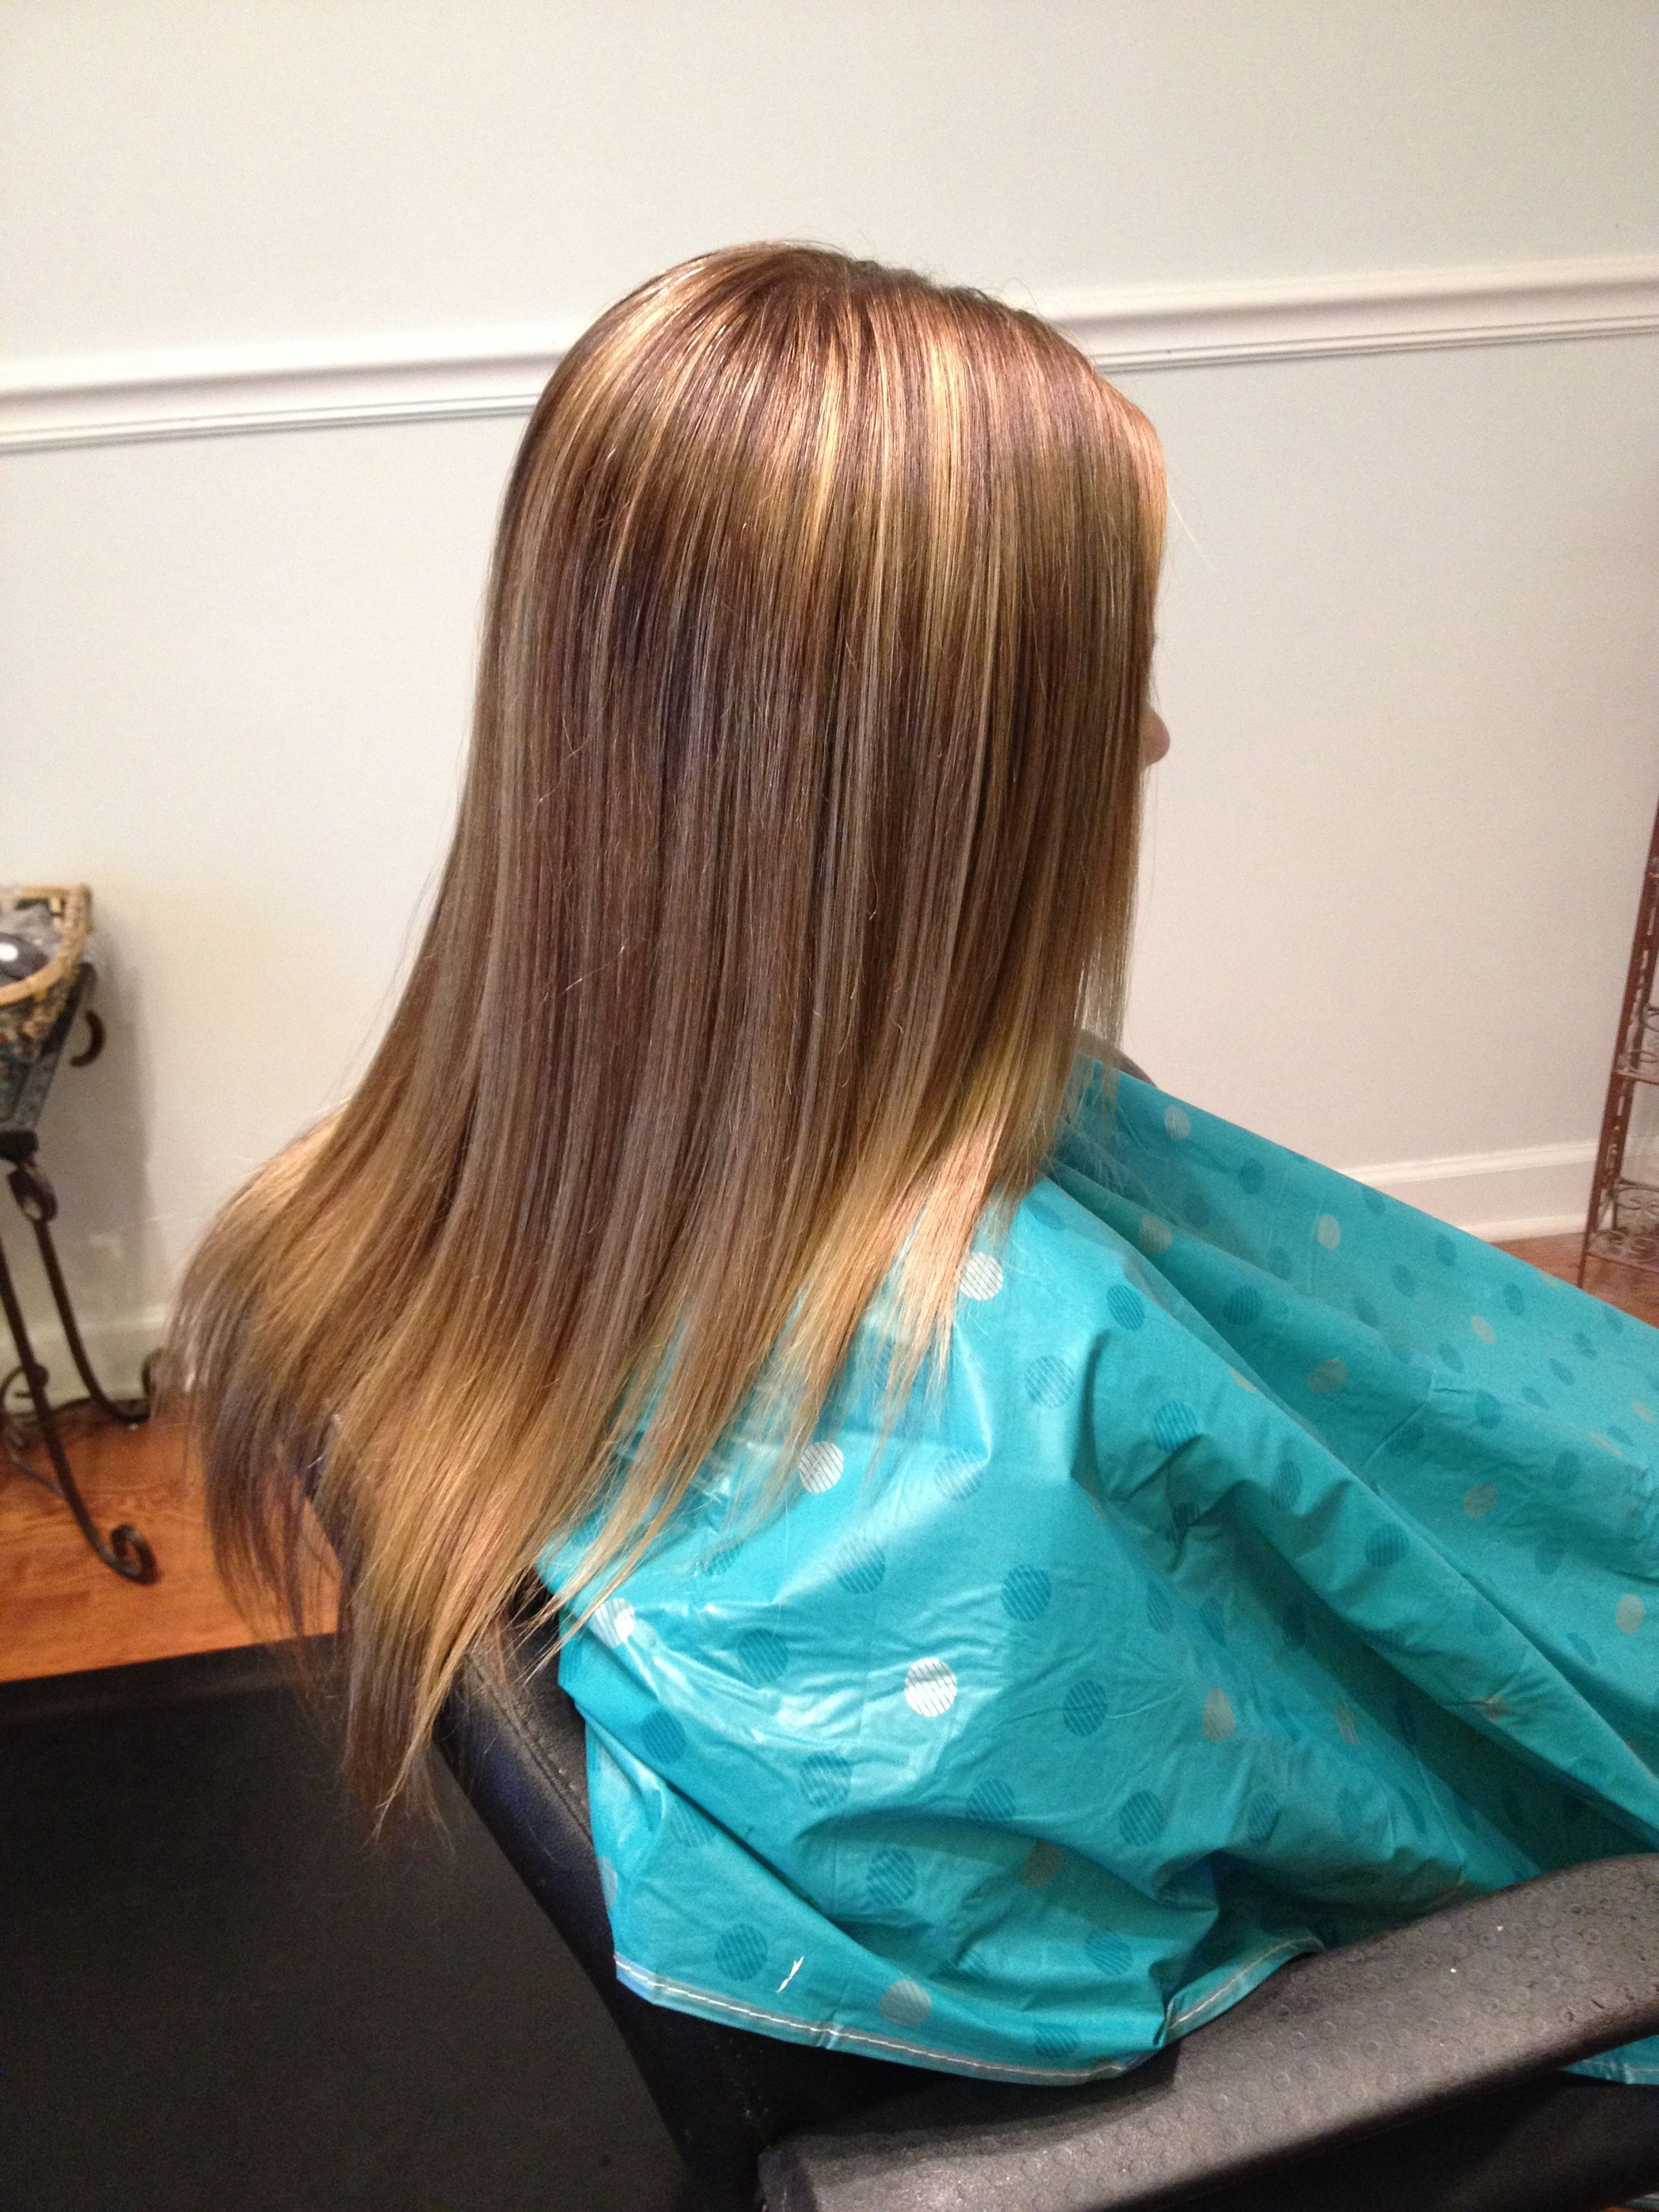 13 Year Old Cheerleaders First Partial Highlight Hair Styles Long Hair Styles Hair